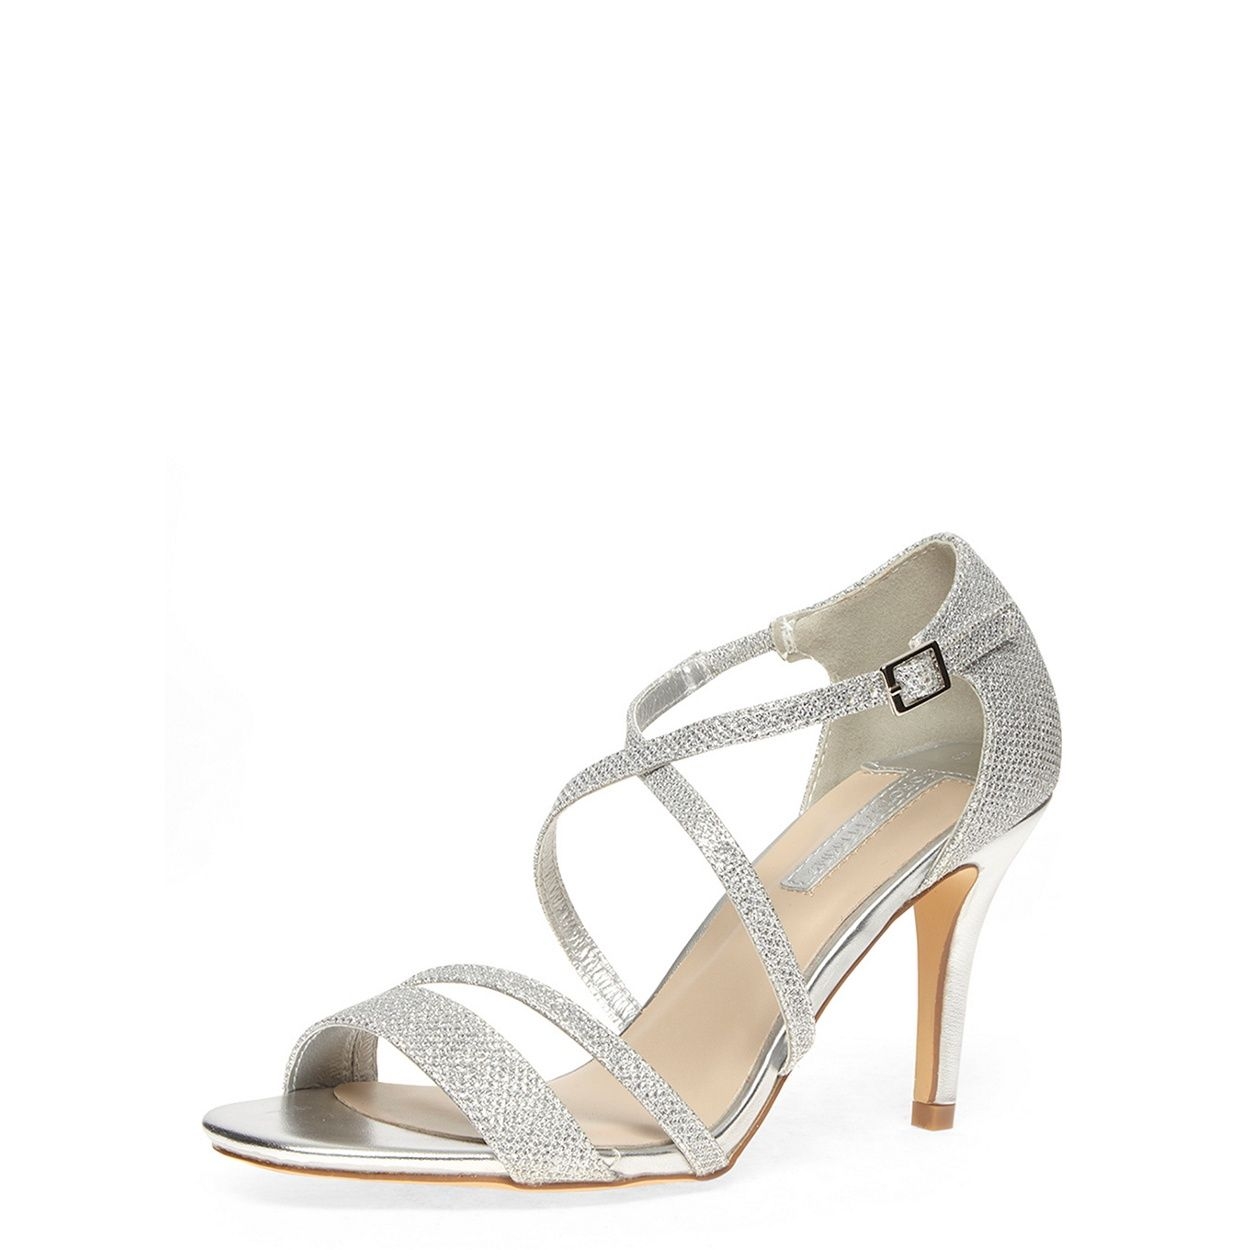 Women's sandals debenhams - Dorothy Perkins Silver Glitter Strappy Sandals At Debenhams Com